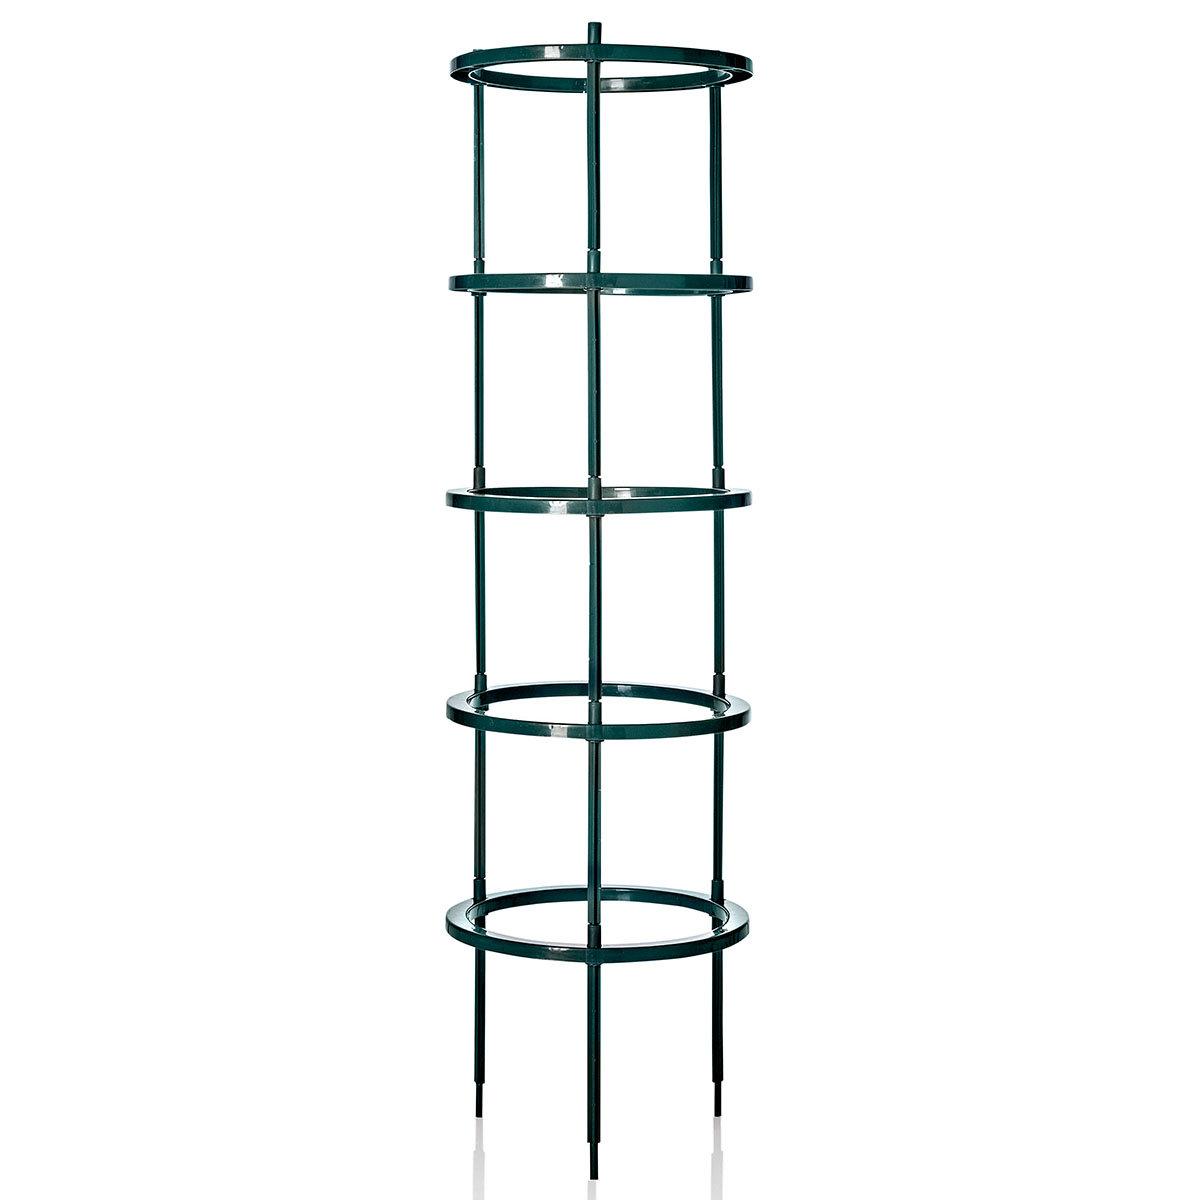 Rankhilfe, Kunststoff, grün, ca. 120 x 32 cm | #2